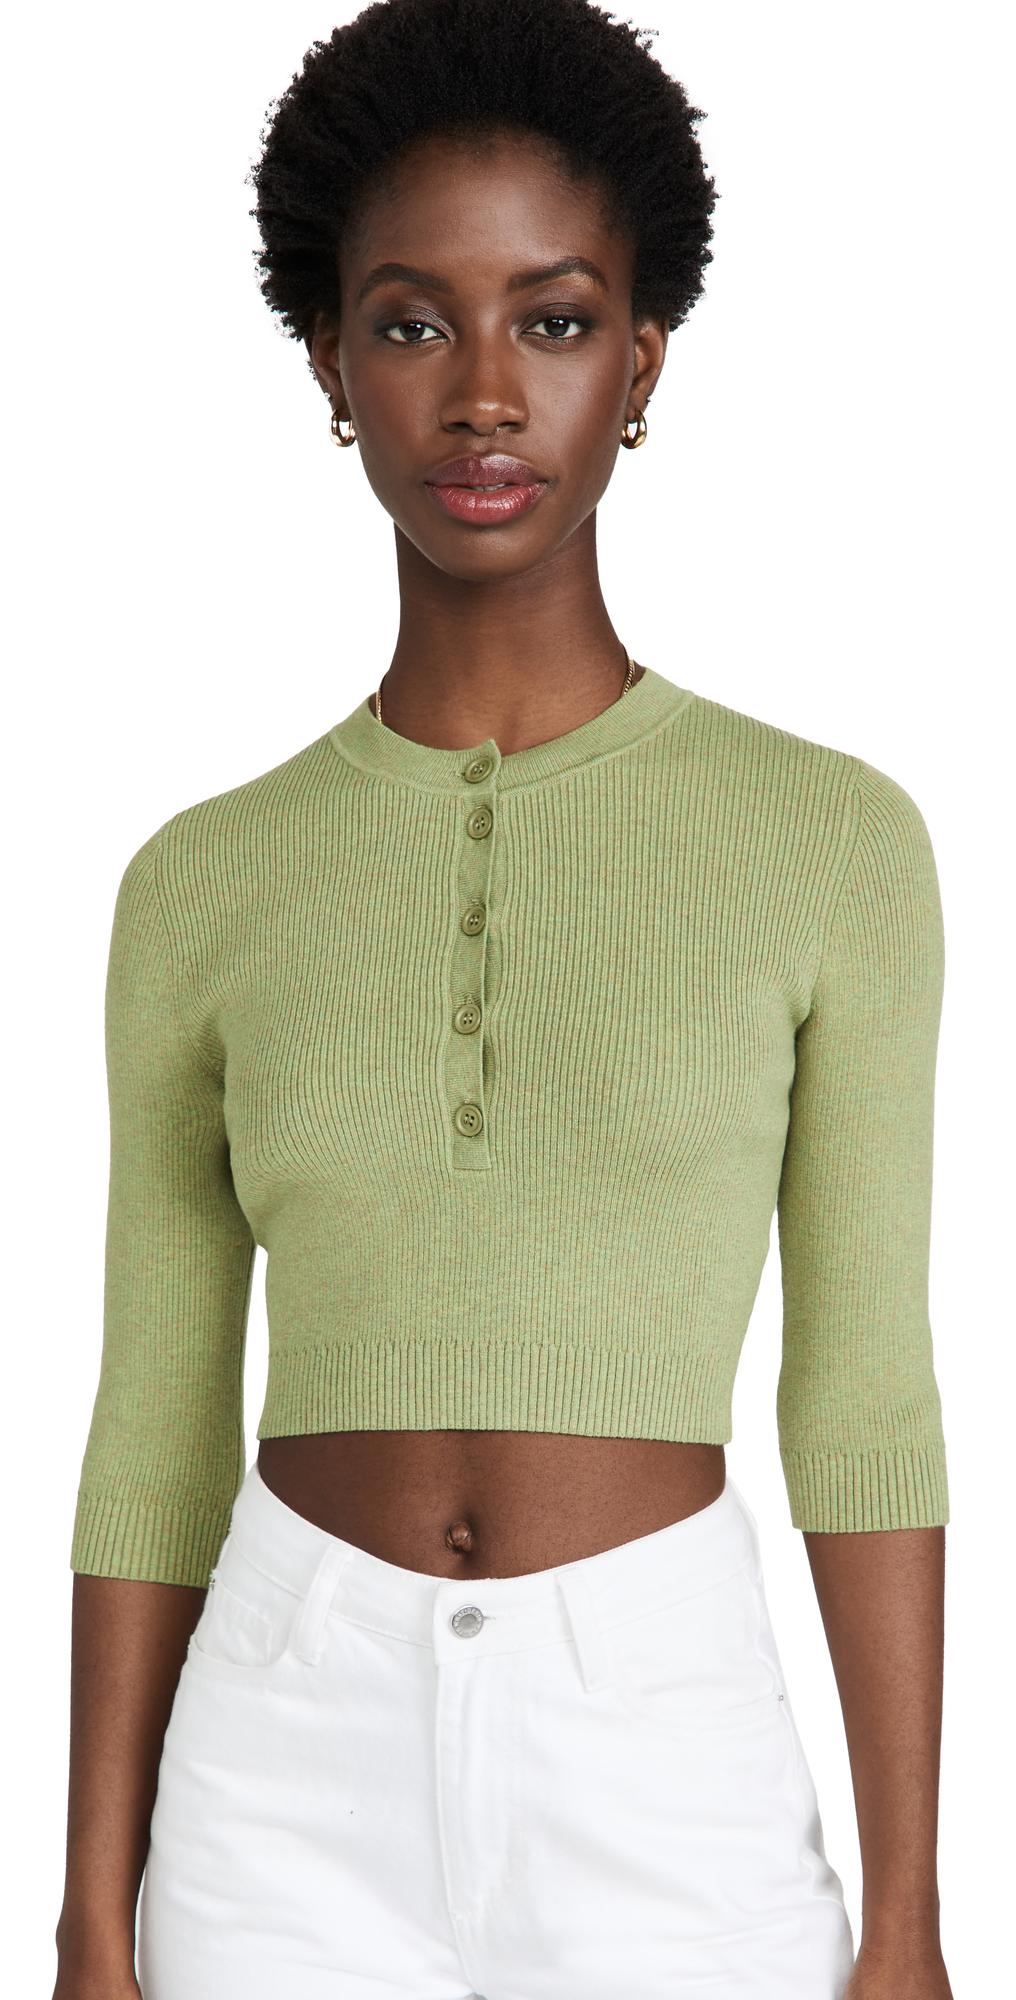 3/4 Sleeve Crop Top